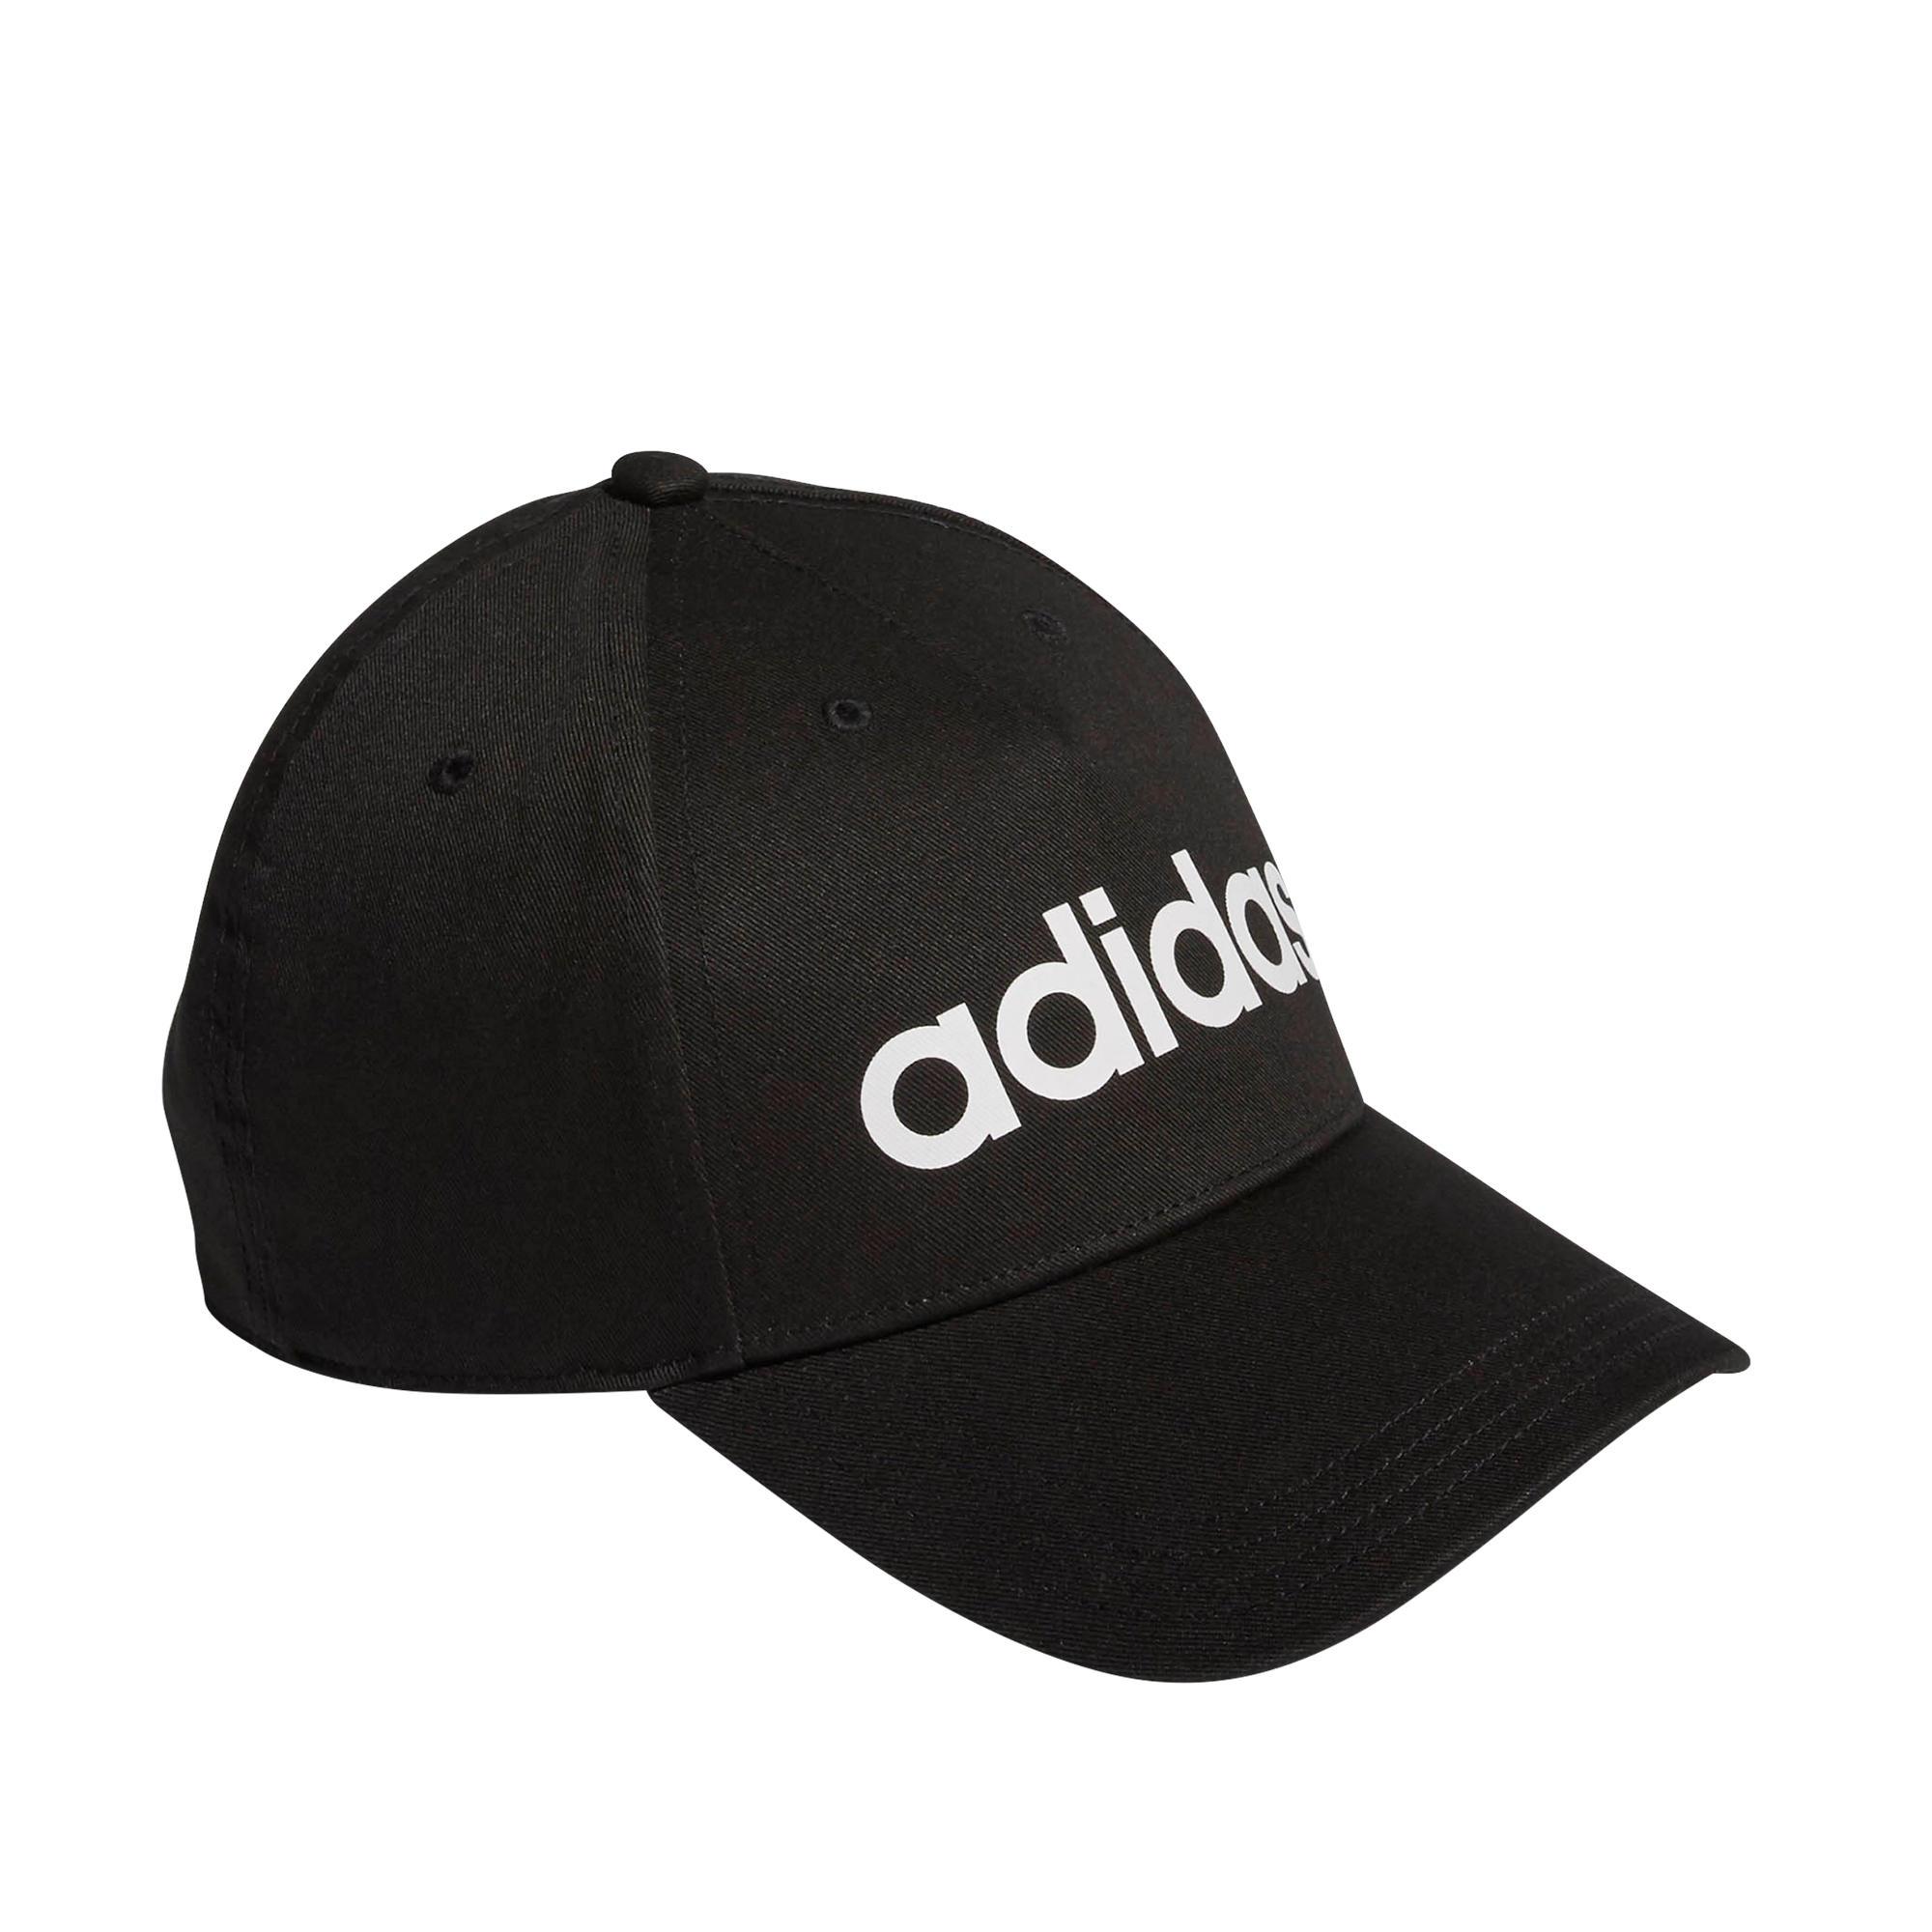 Adidas Cappellino  bambino nero-bianco